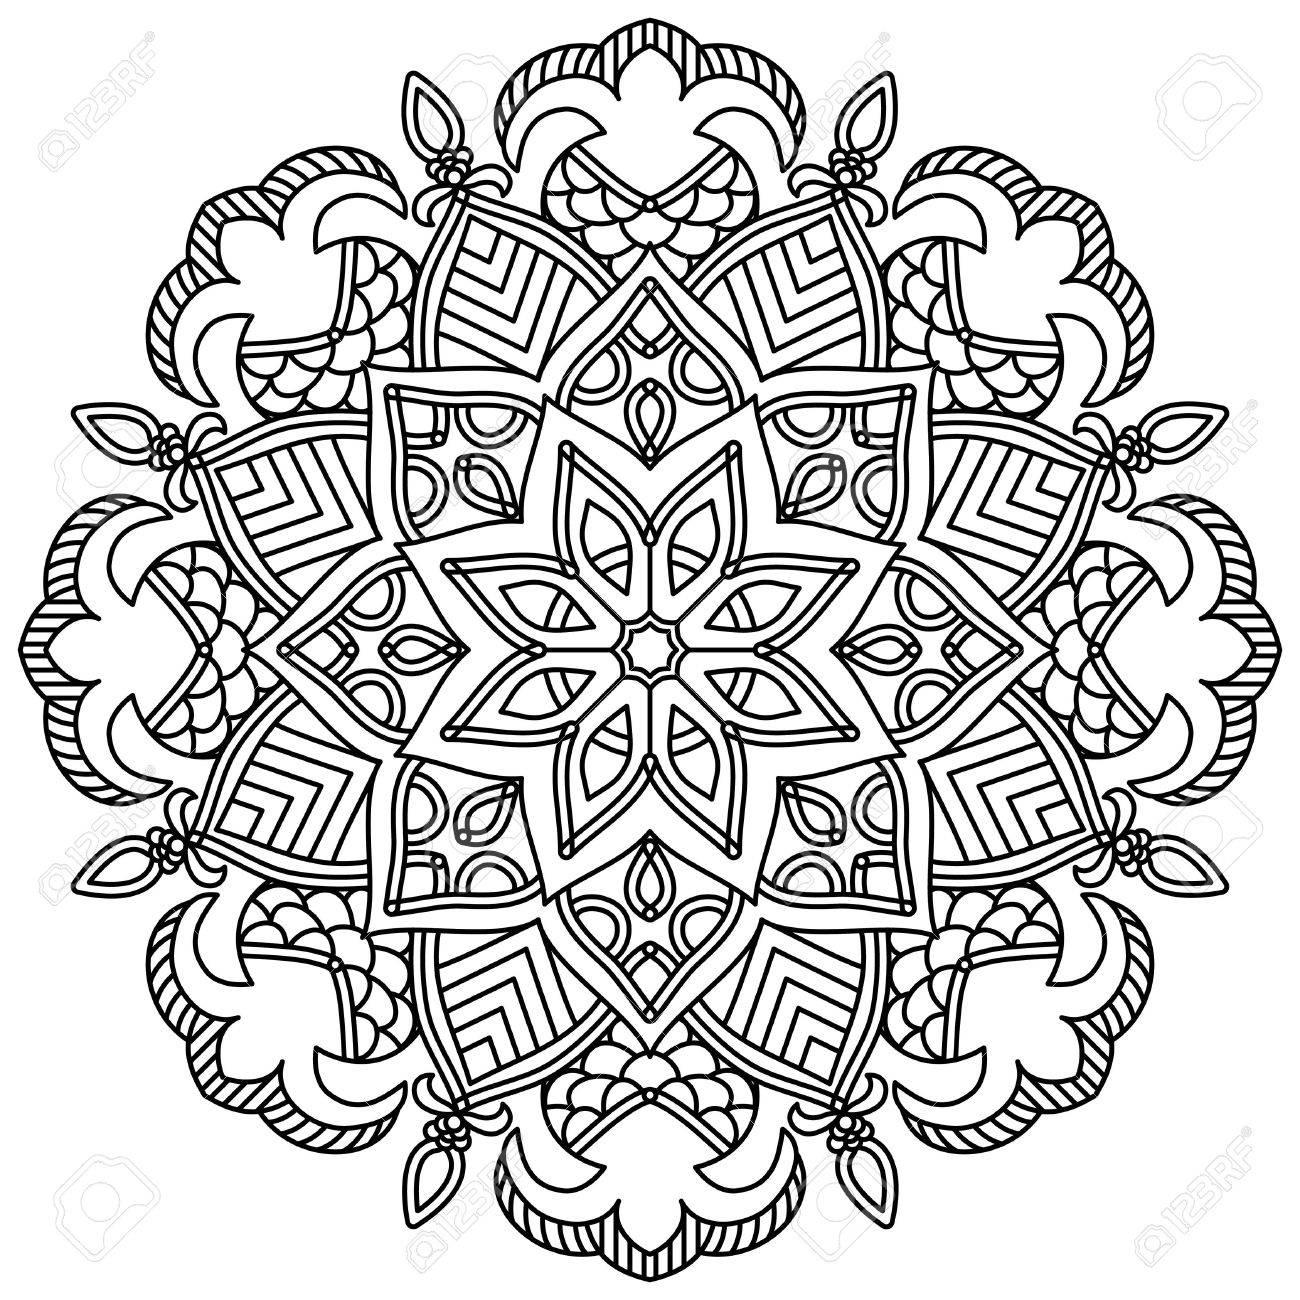 Mandala. Vintage Patrón Ornamento Oval. Elemento Decorativo Para ...